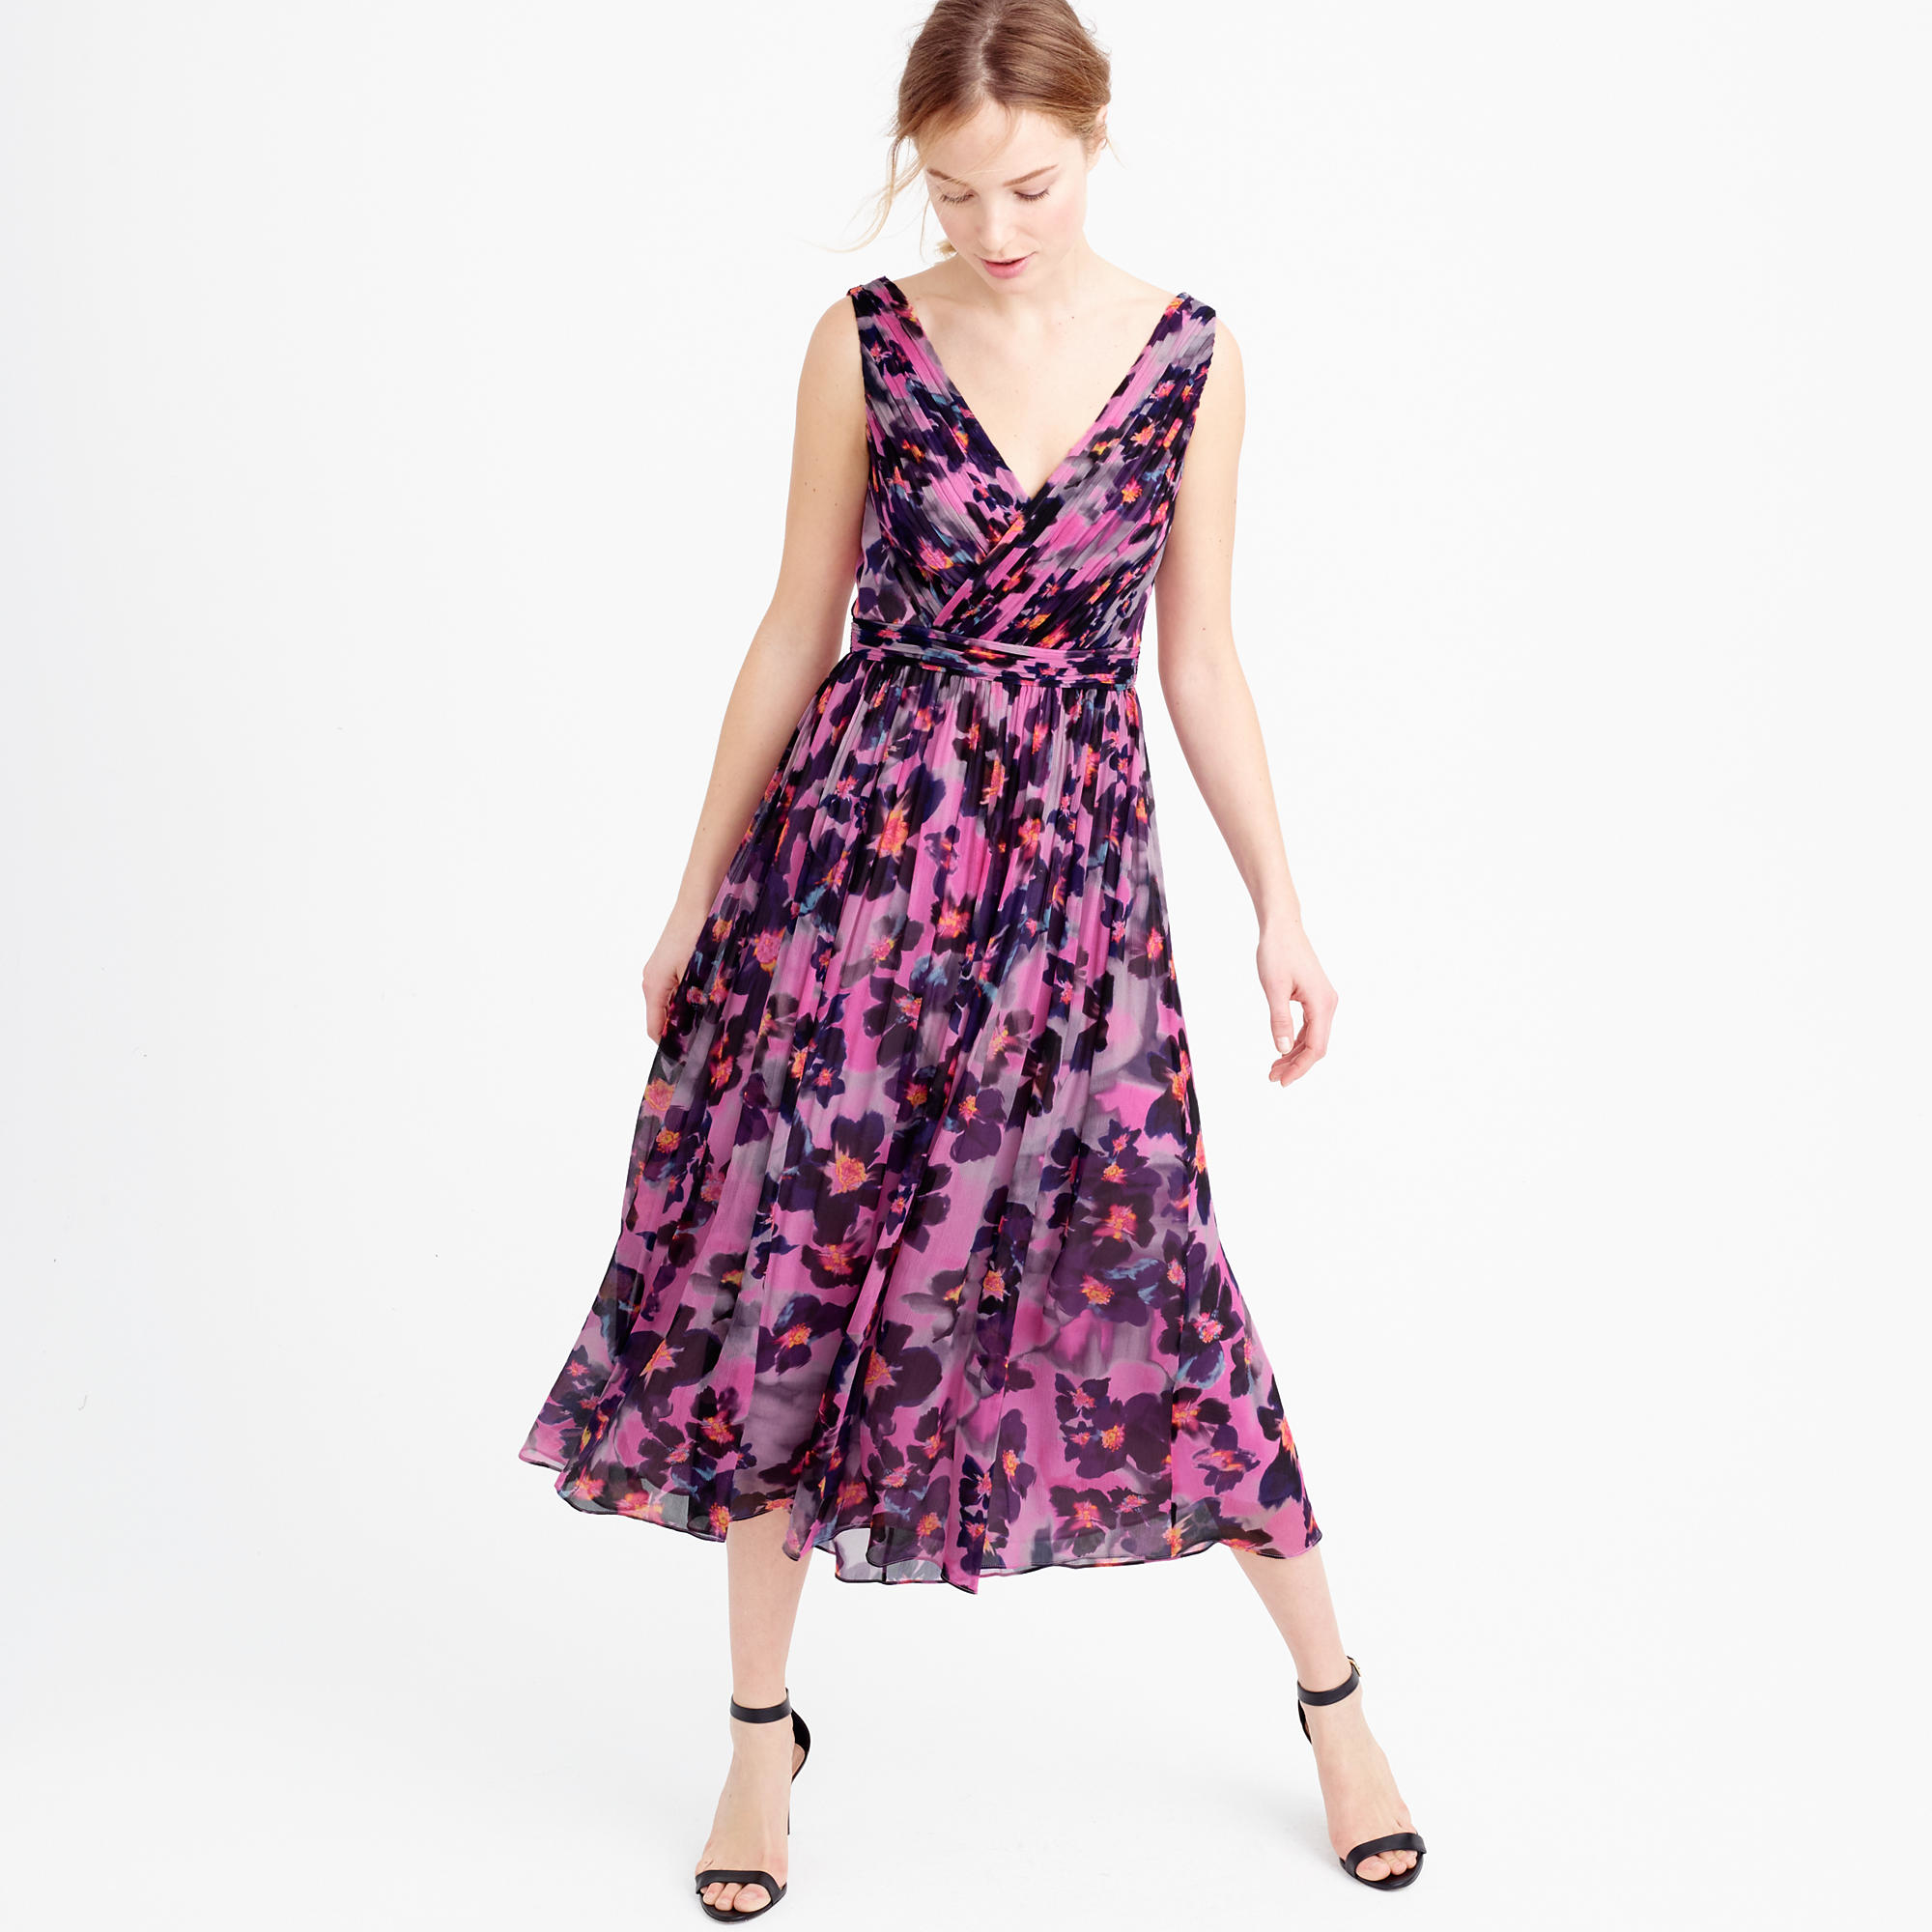 Can floral silk chiffon dress